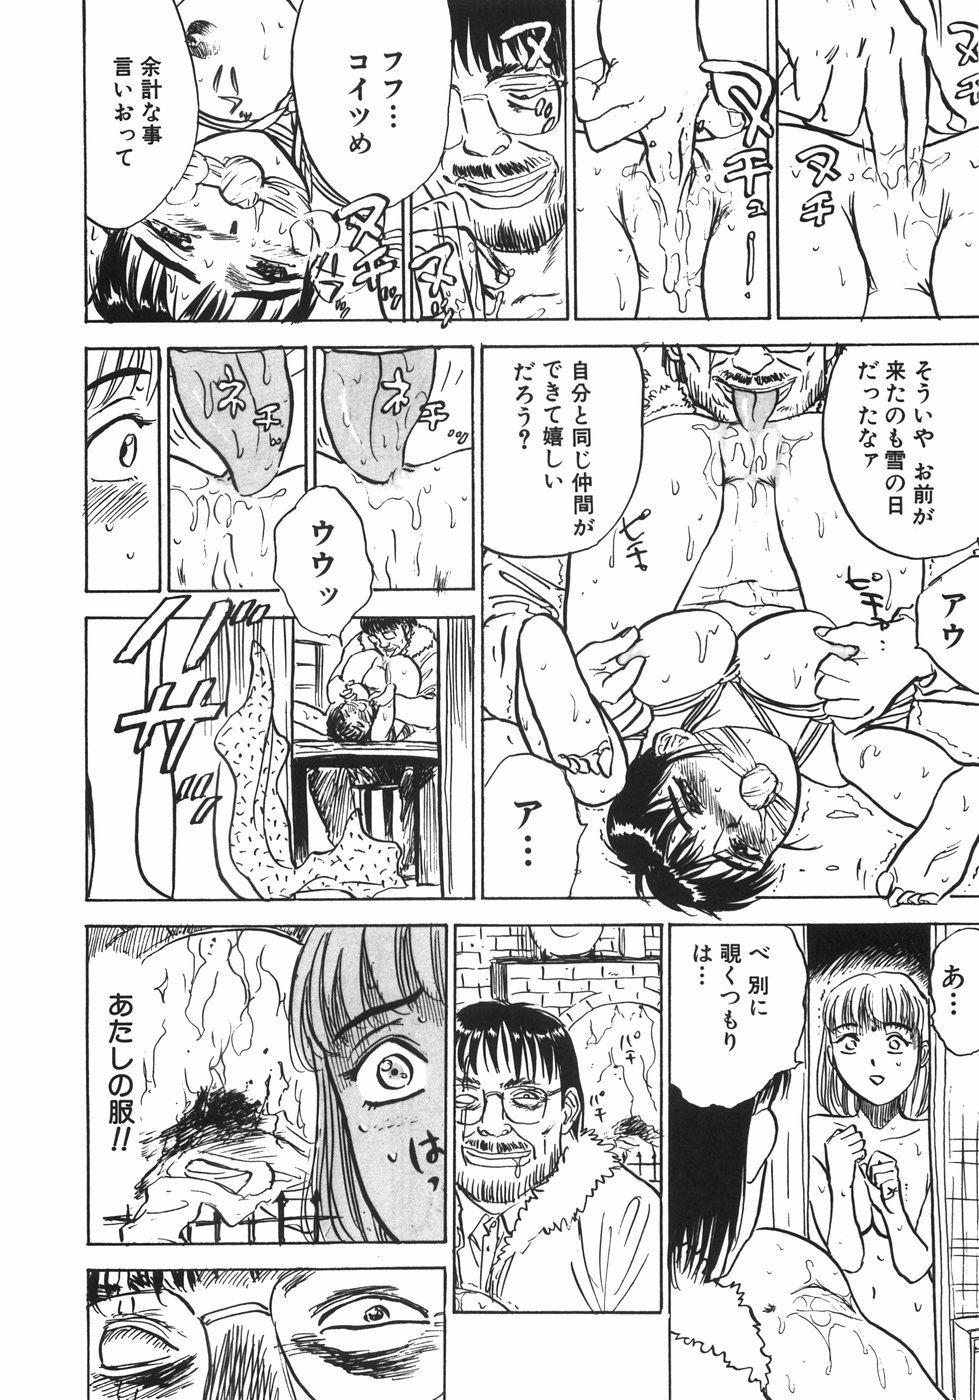 Ningyou no Yakata - The Doll House 14